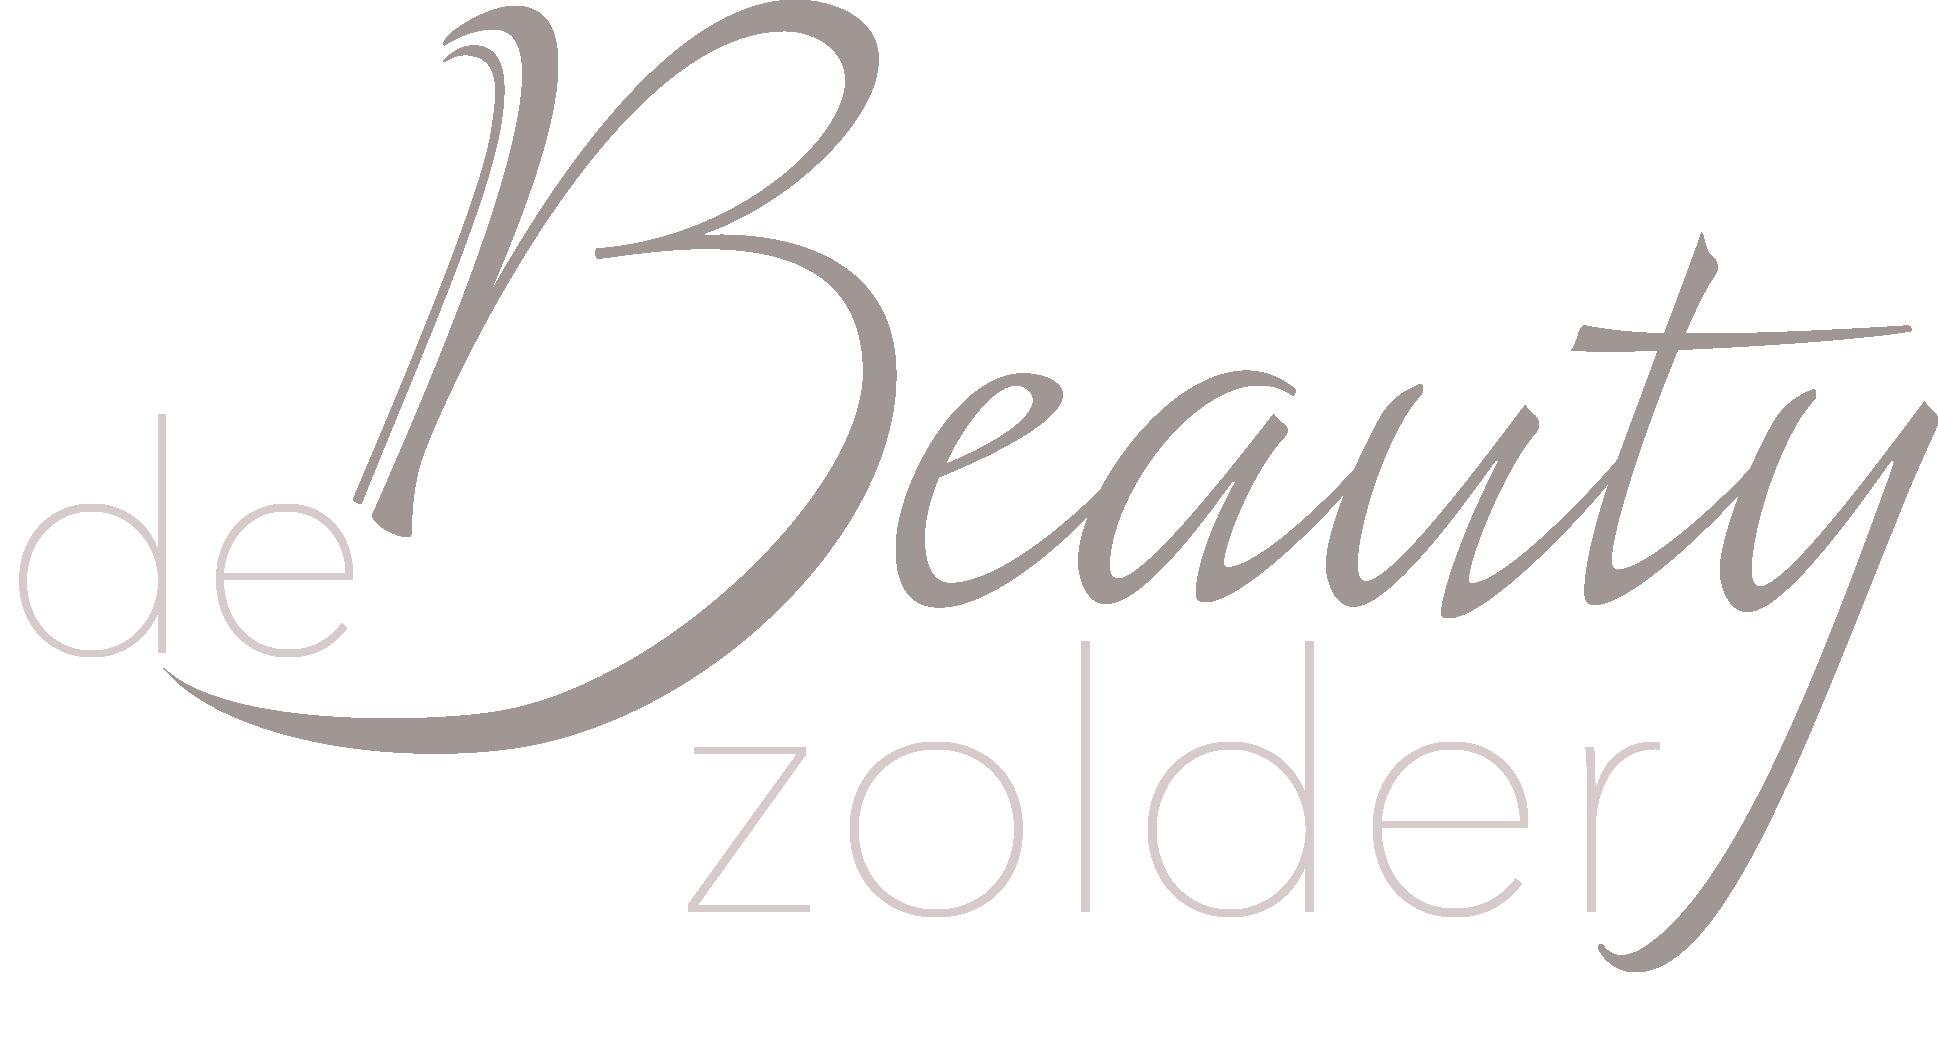 De Beautyzolder